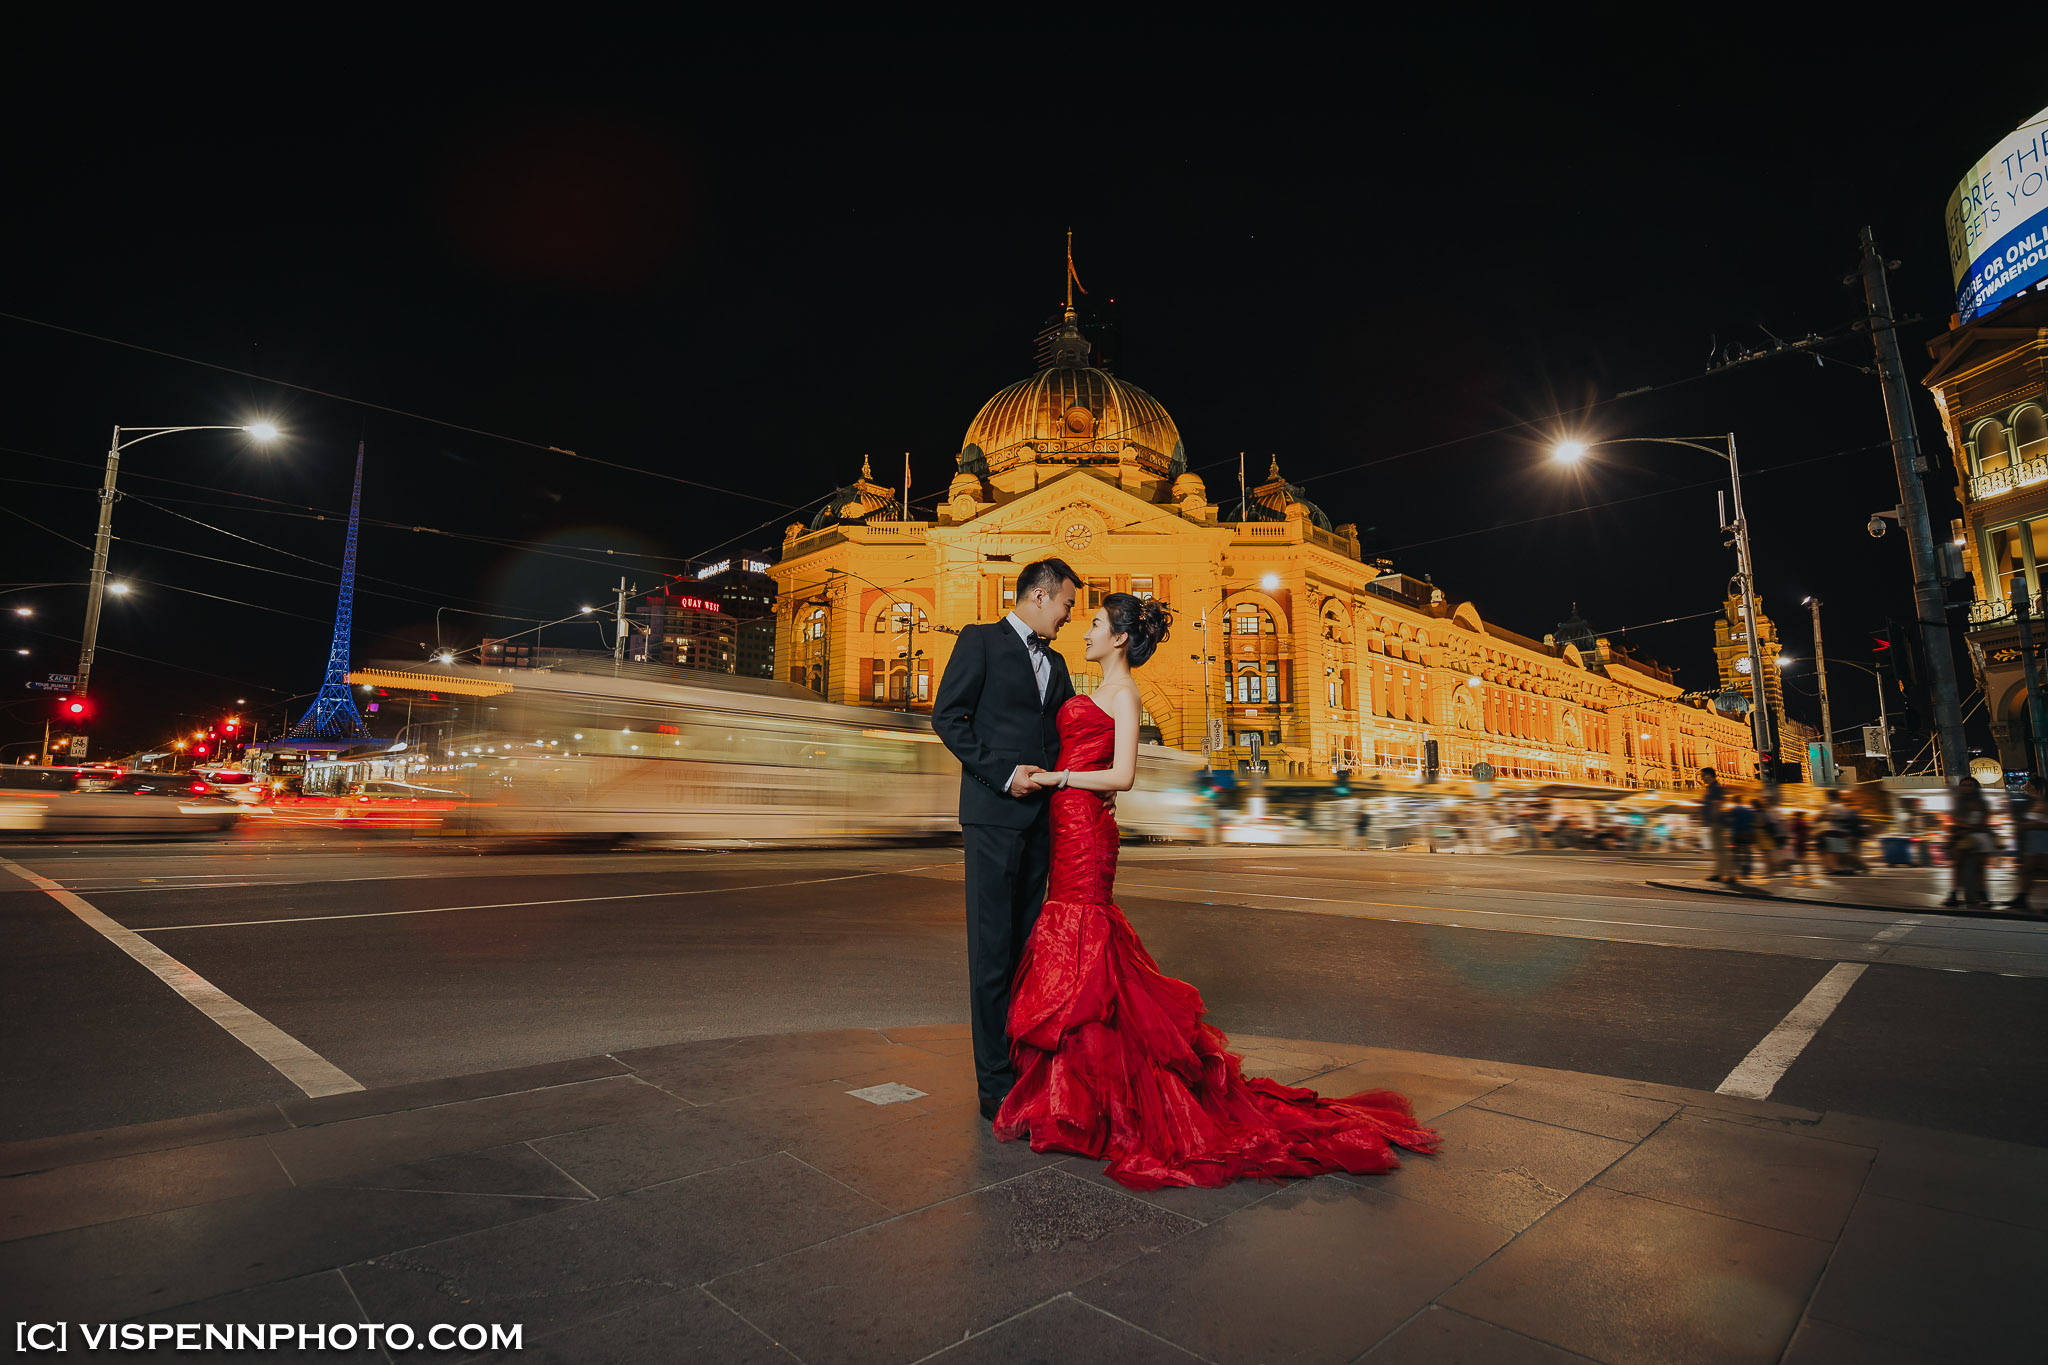 PRE WEDDING Photography Melbourne 5D4 3525